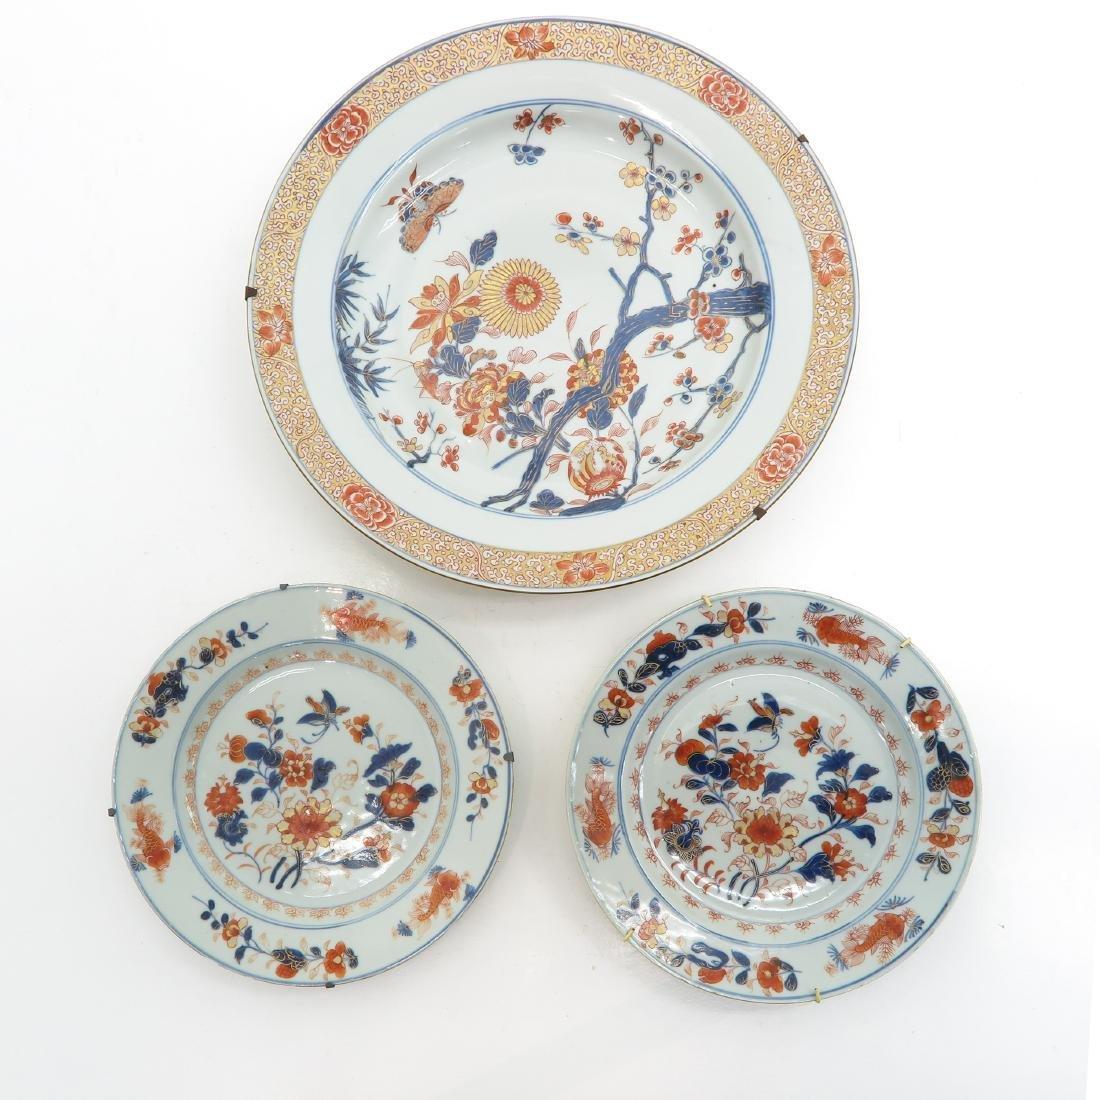 A Lot of 3 Imari Decor Plates